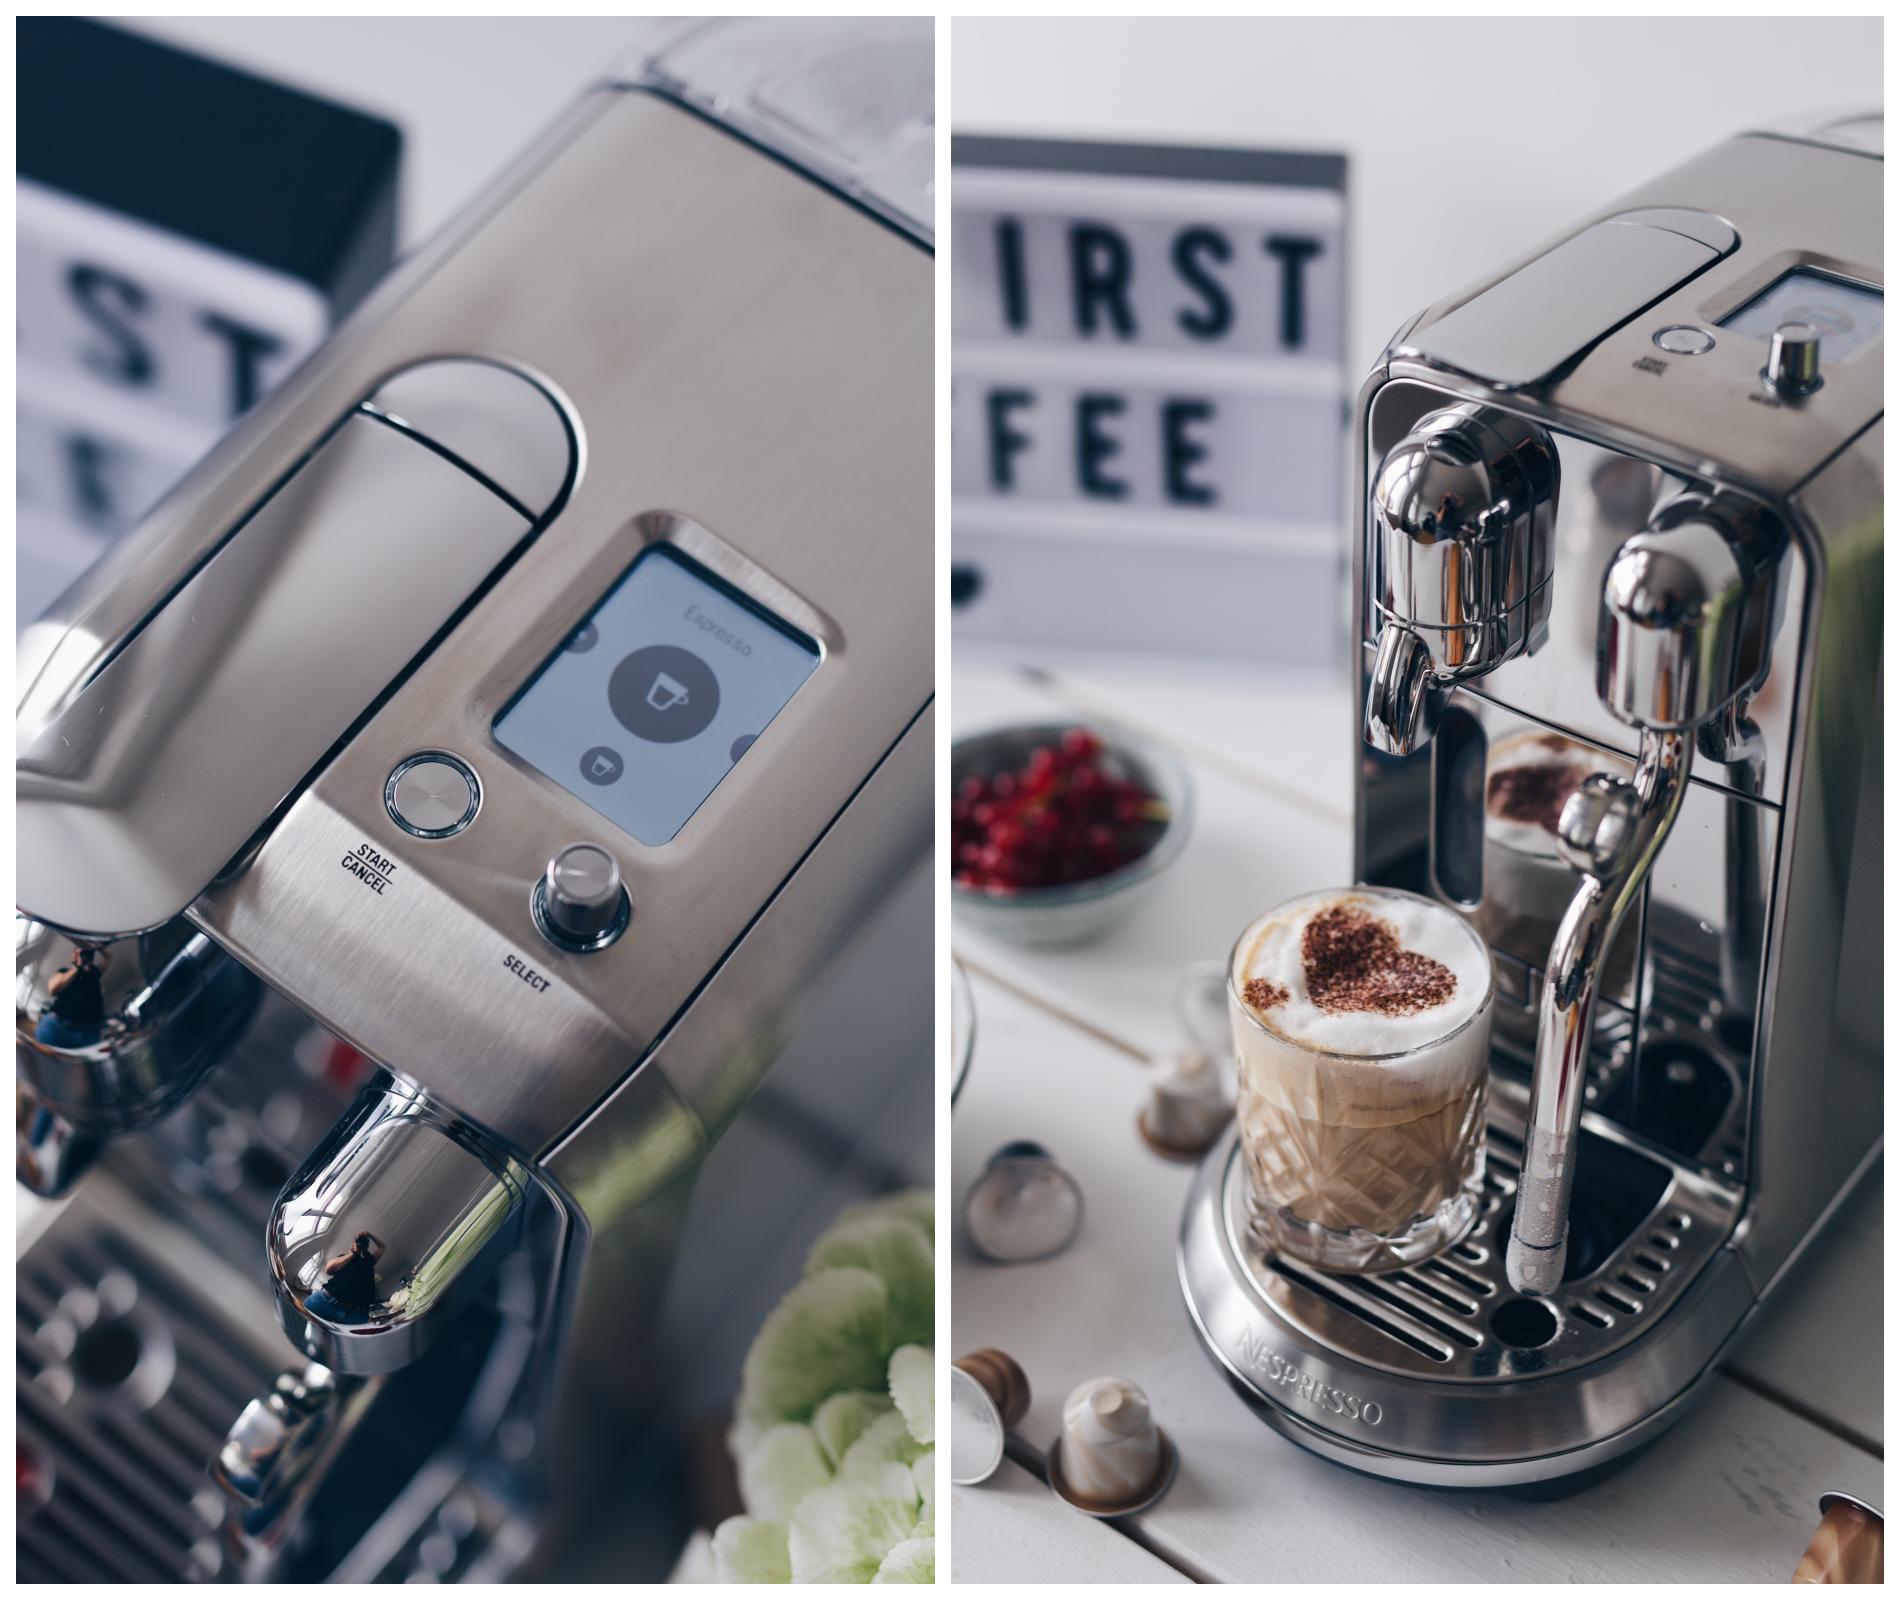 Creatista Plus von Nespresso, Barista Nespresso